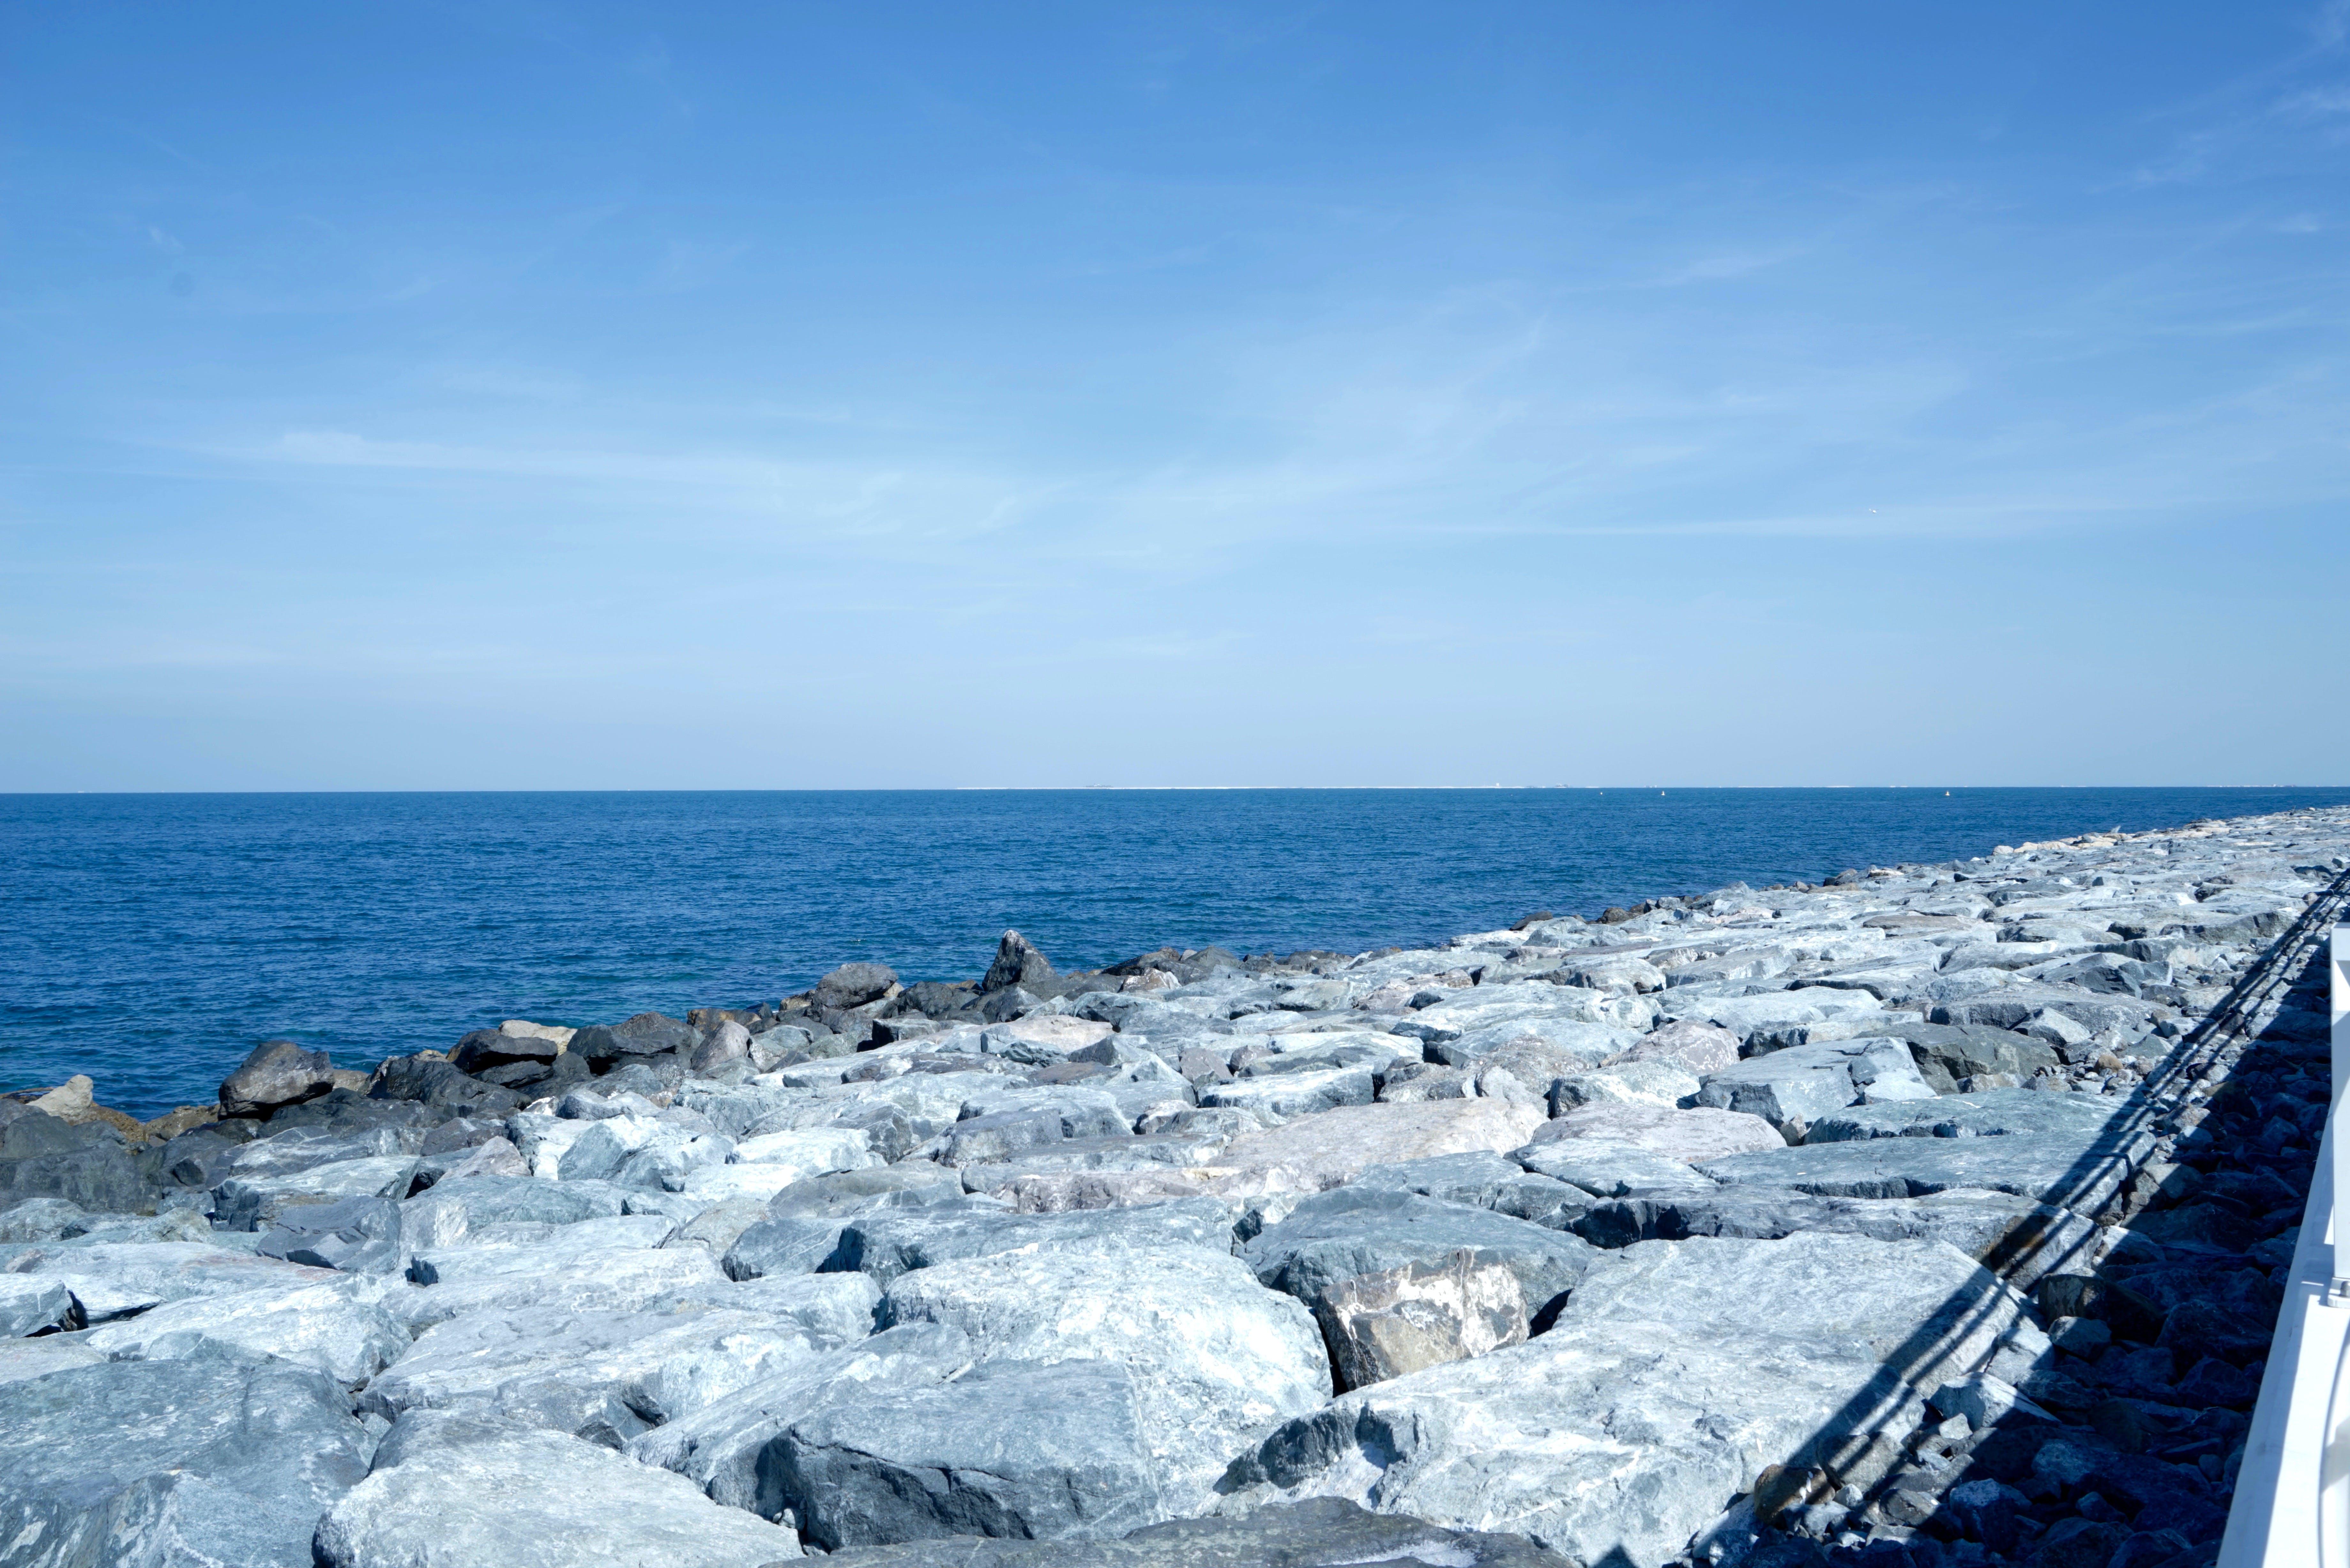 Free stock photo of Dubai Beach